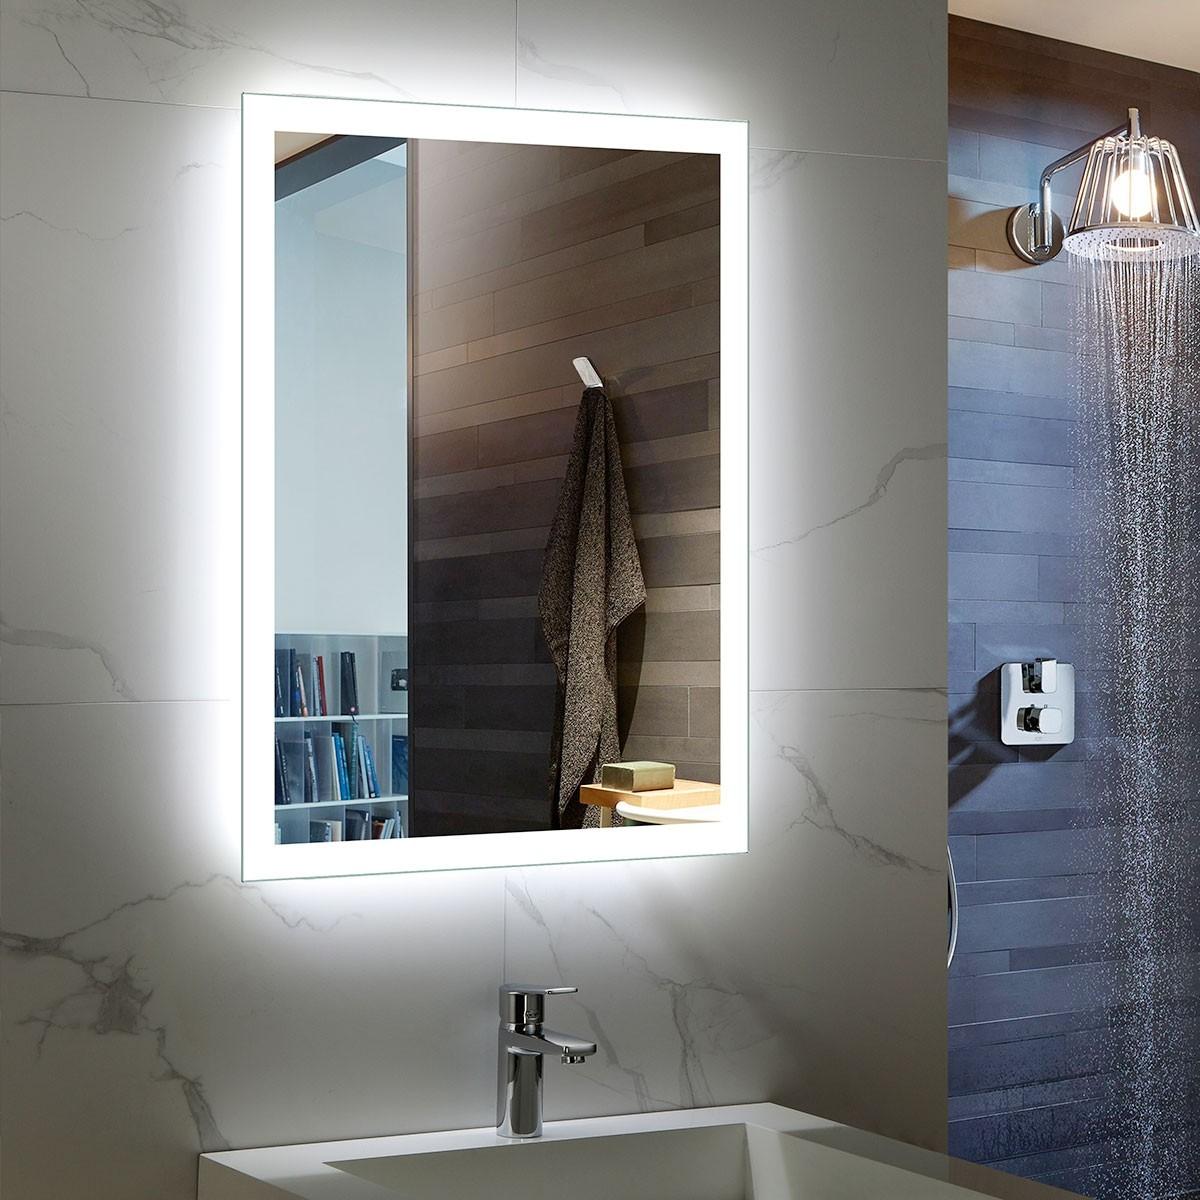 DECORAPORT 24 x 32 Inch LED Bathroom Mirror/Dress Mirror with Infrared Sensor Control, Anti-Fog, Vertical & Horizontal Mount (NG15-2432)